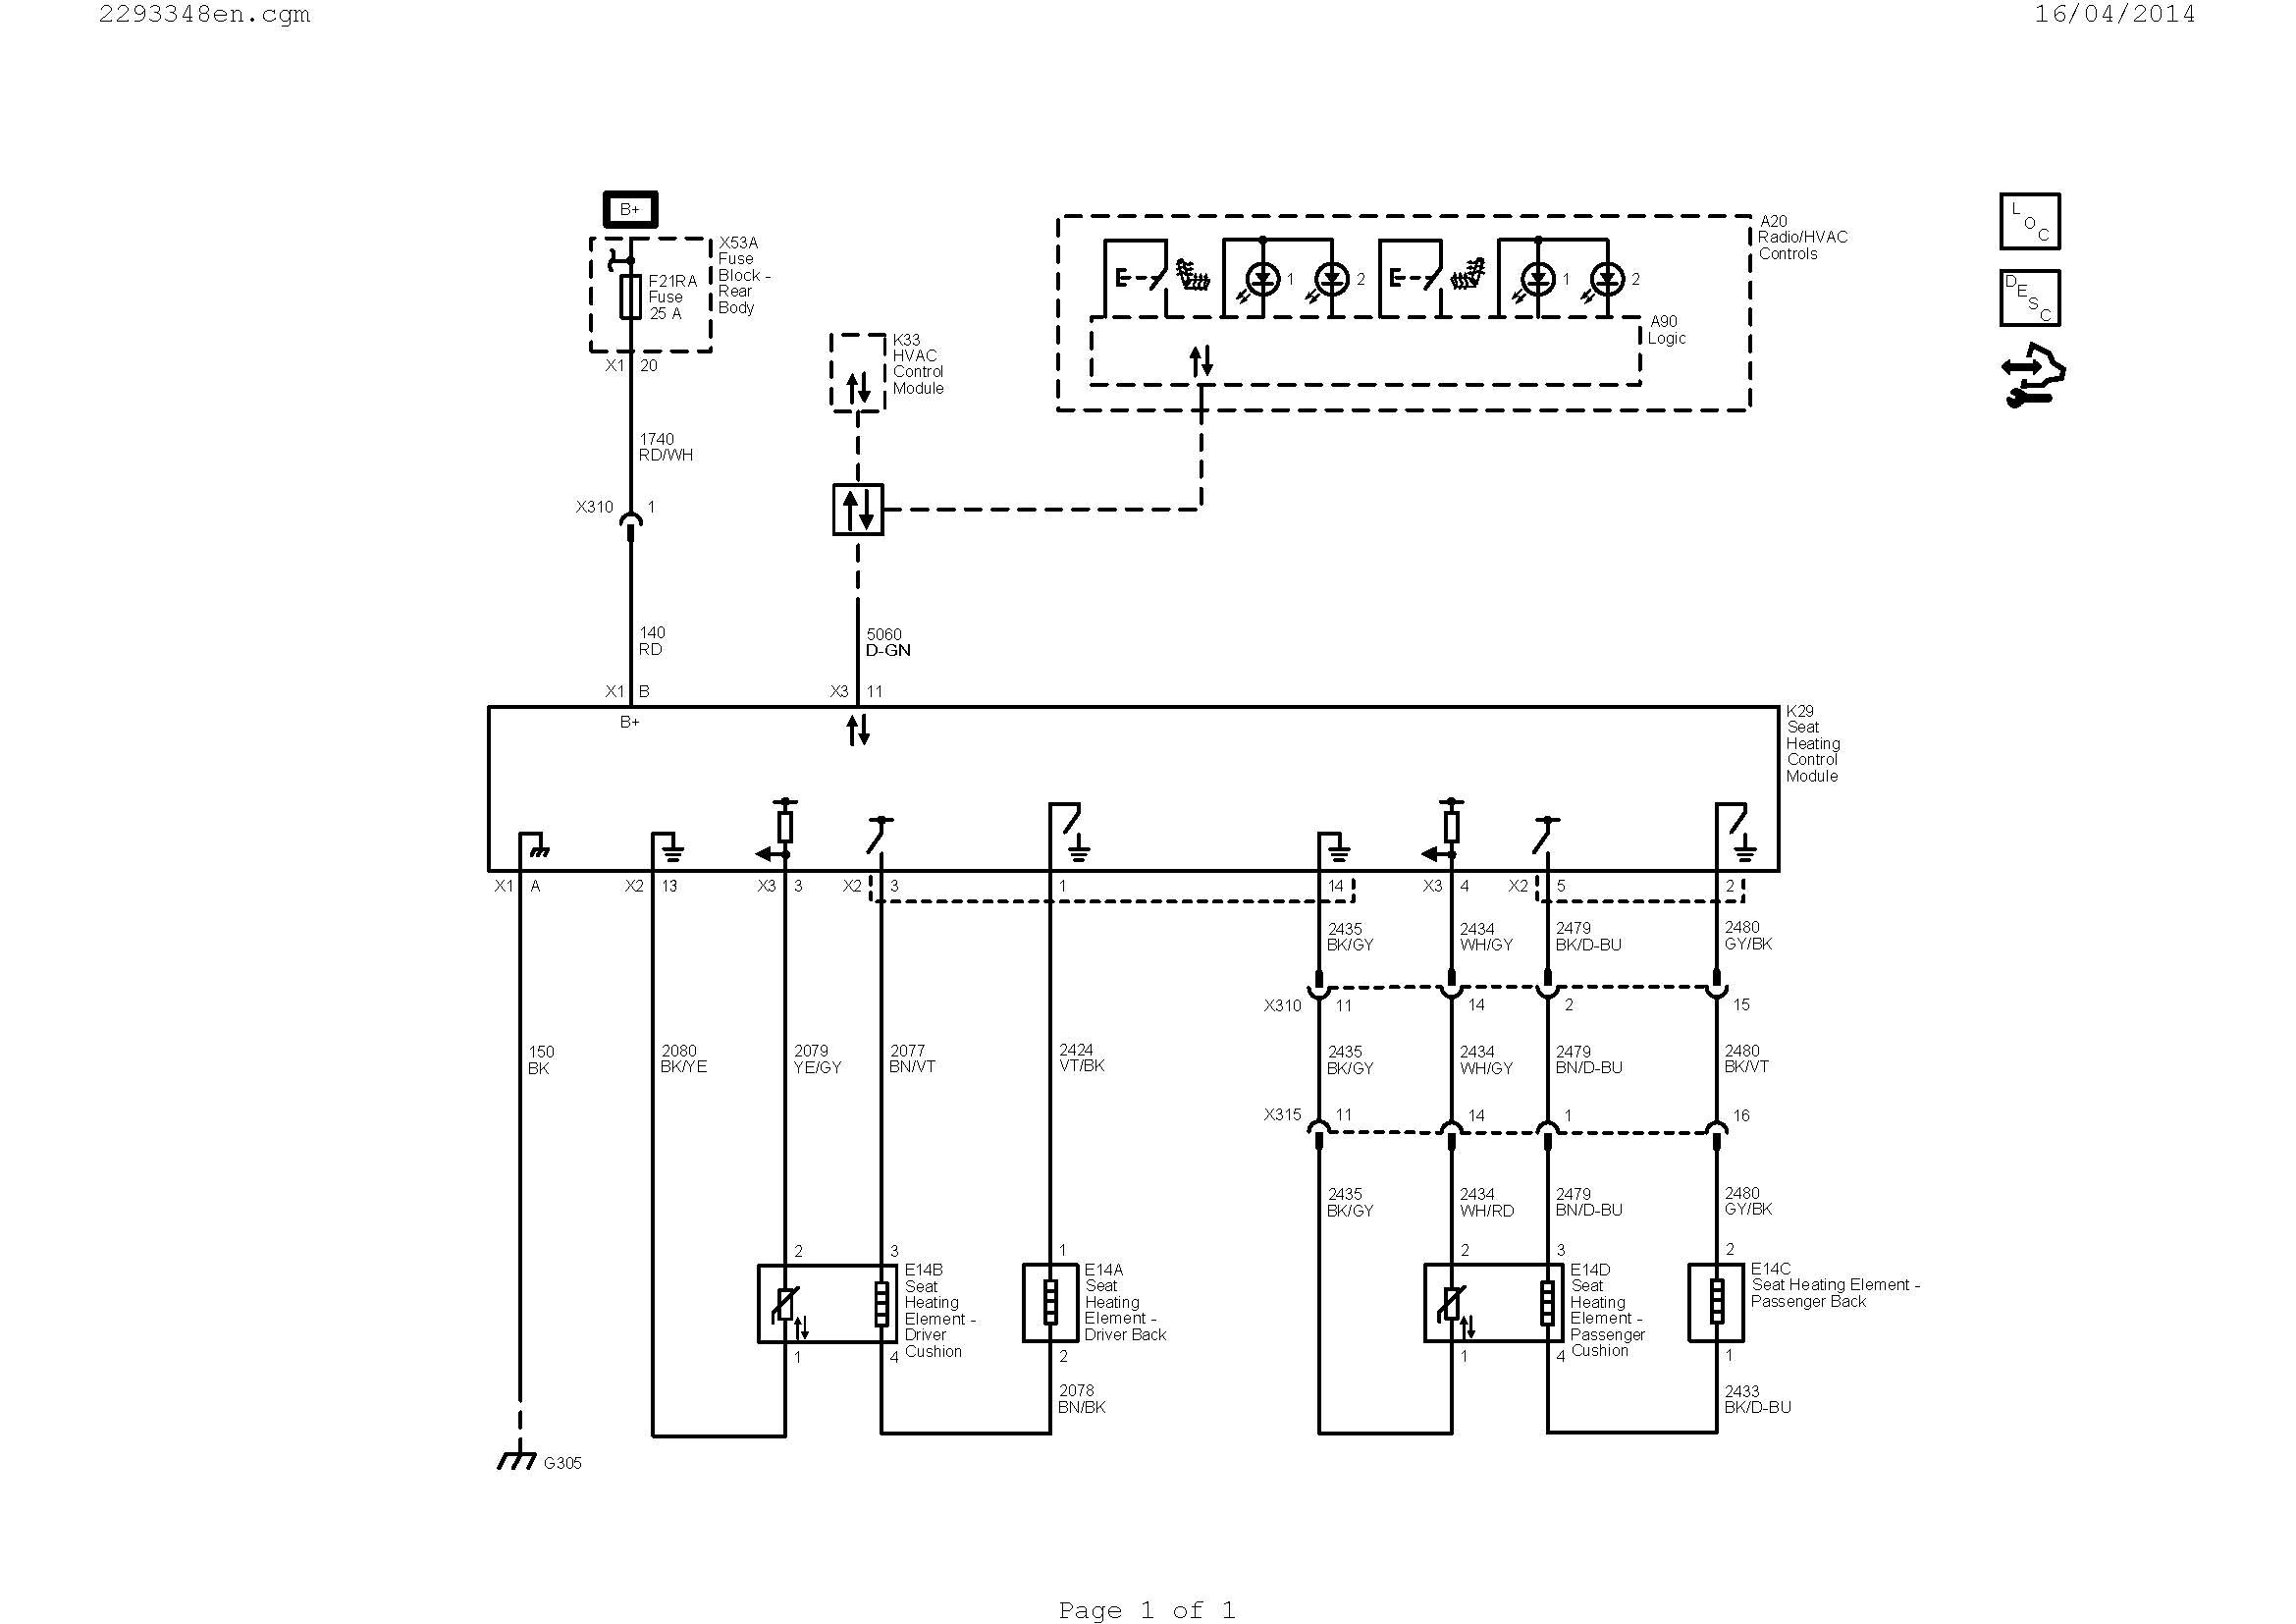 terex tb60 wiring diagram Collection-hvac wiring diagram wiring a ac thermostat diagram new wiring diagram ac valid hvac of hvac wiring diagram 14-f